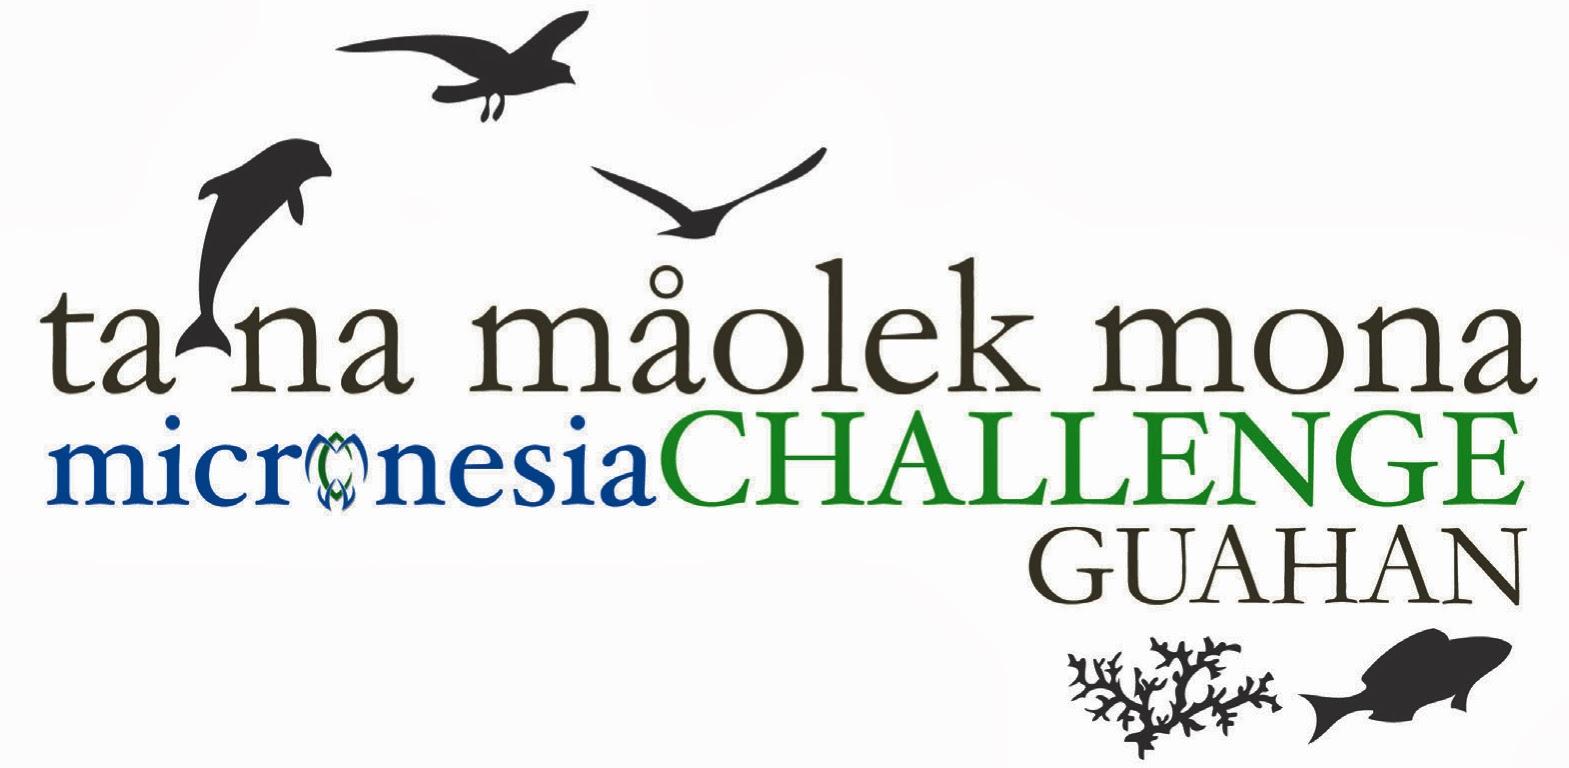 Guam Micronesia Challenge